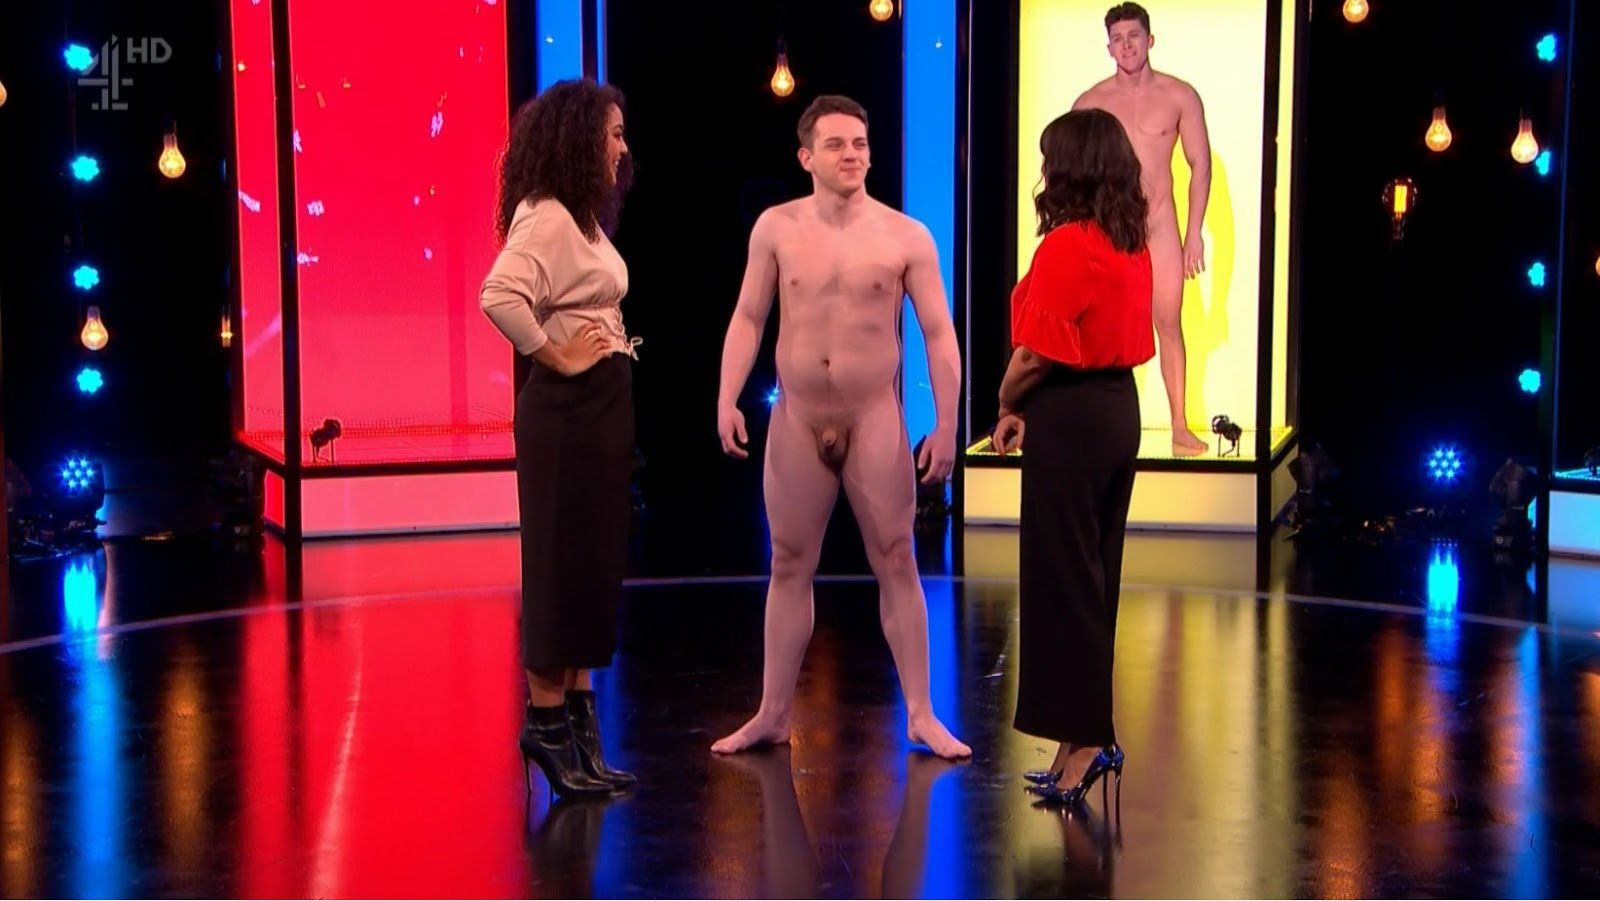 Erotic Tv Show Free Pics